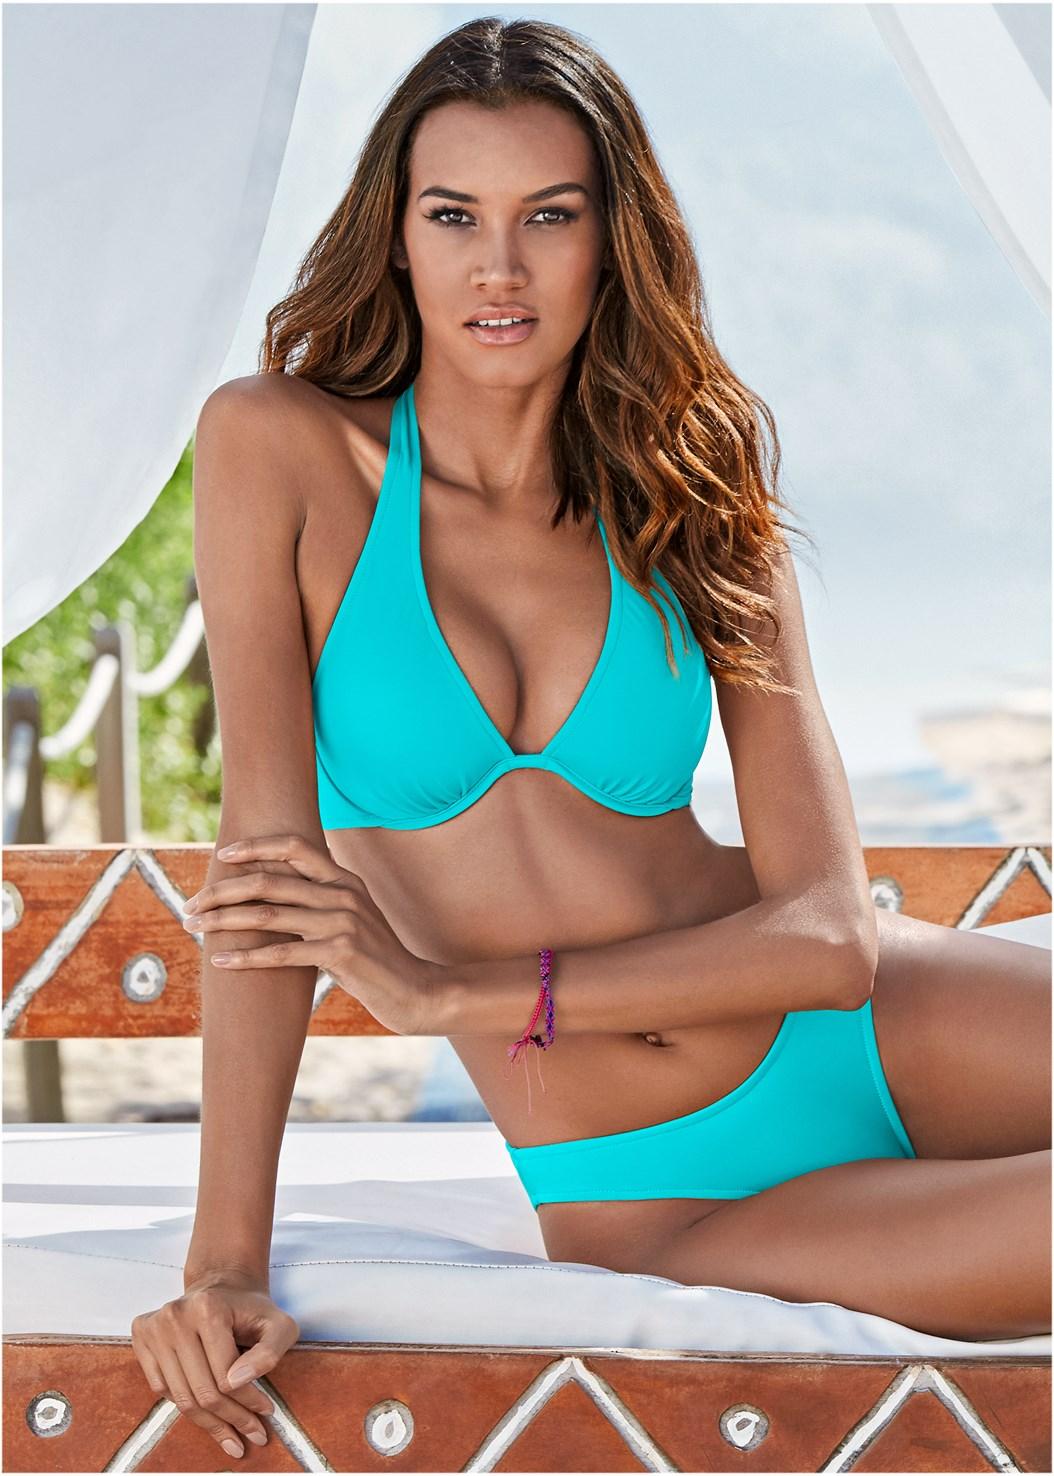 Underwire Halter Bikini Top,Low Rise Bikini Bottom